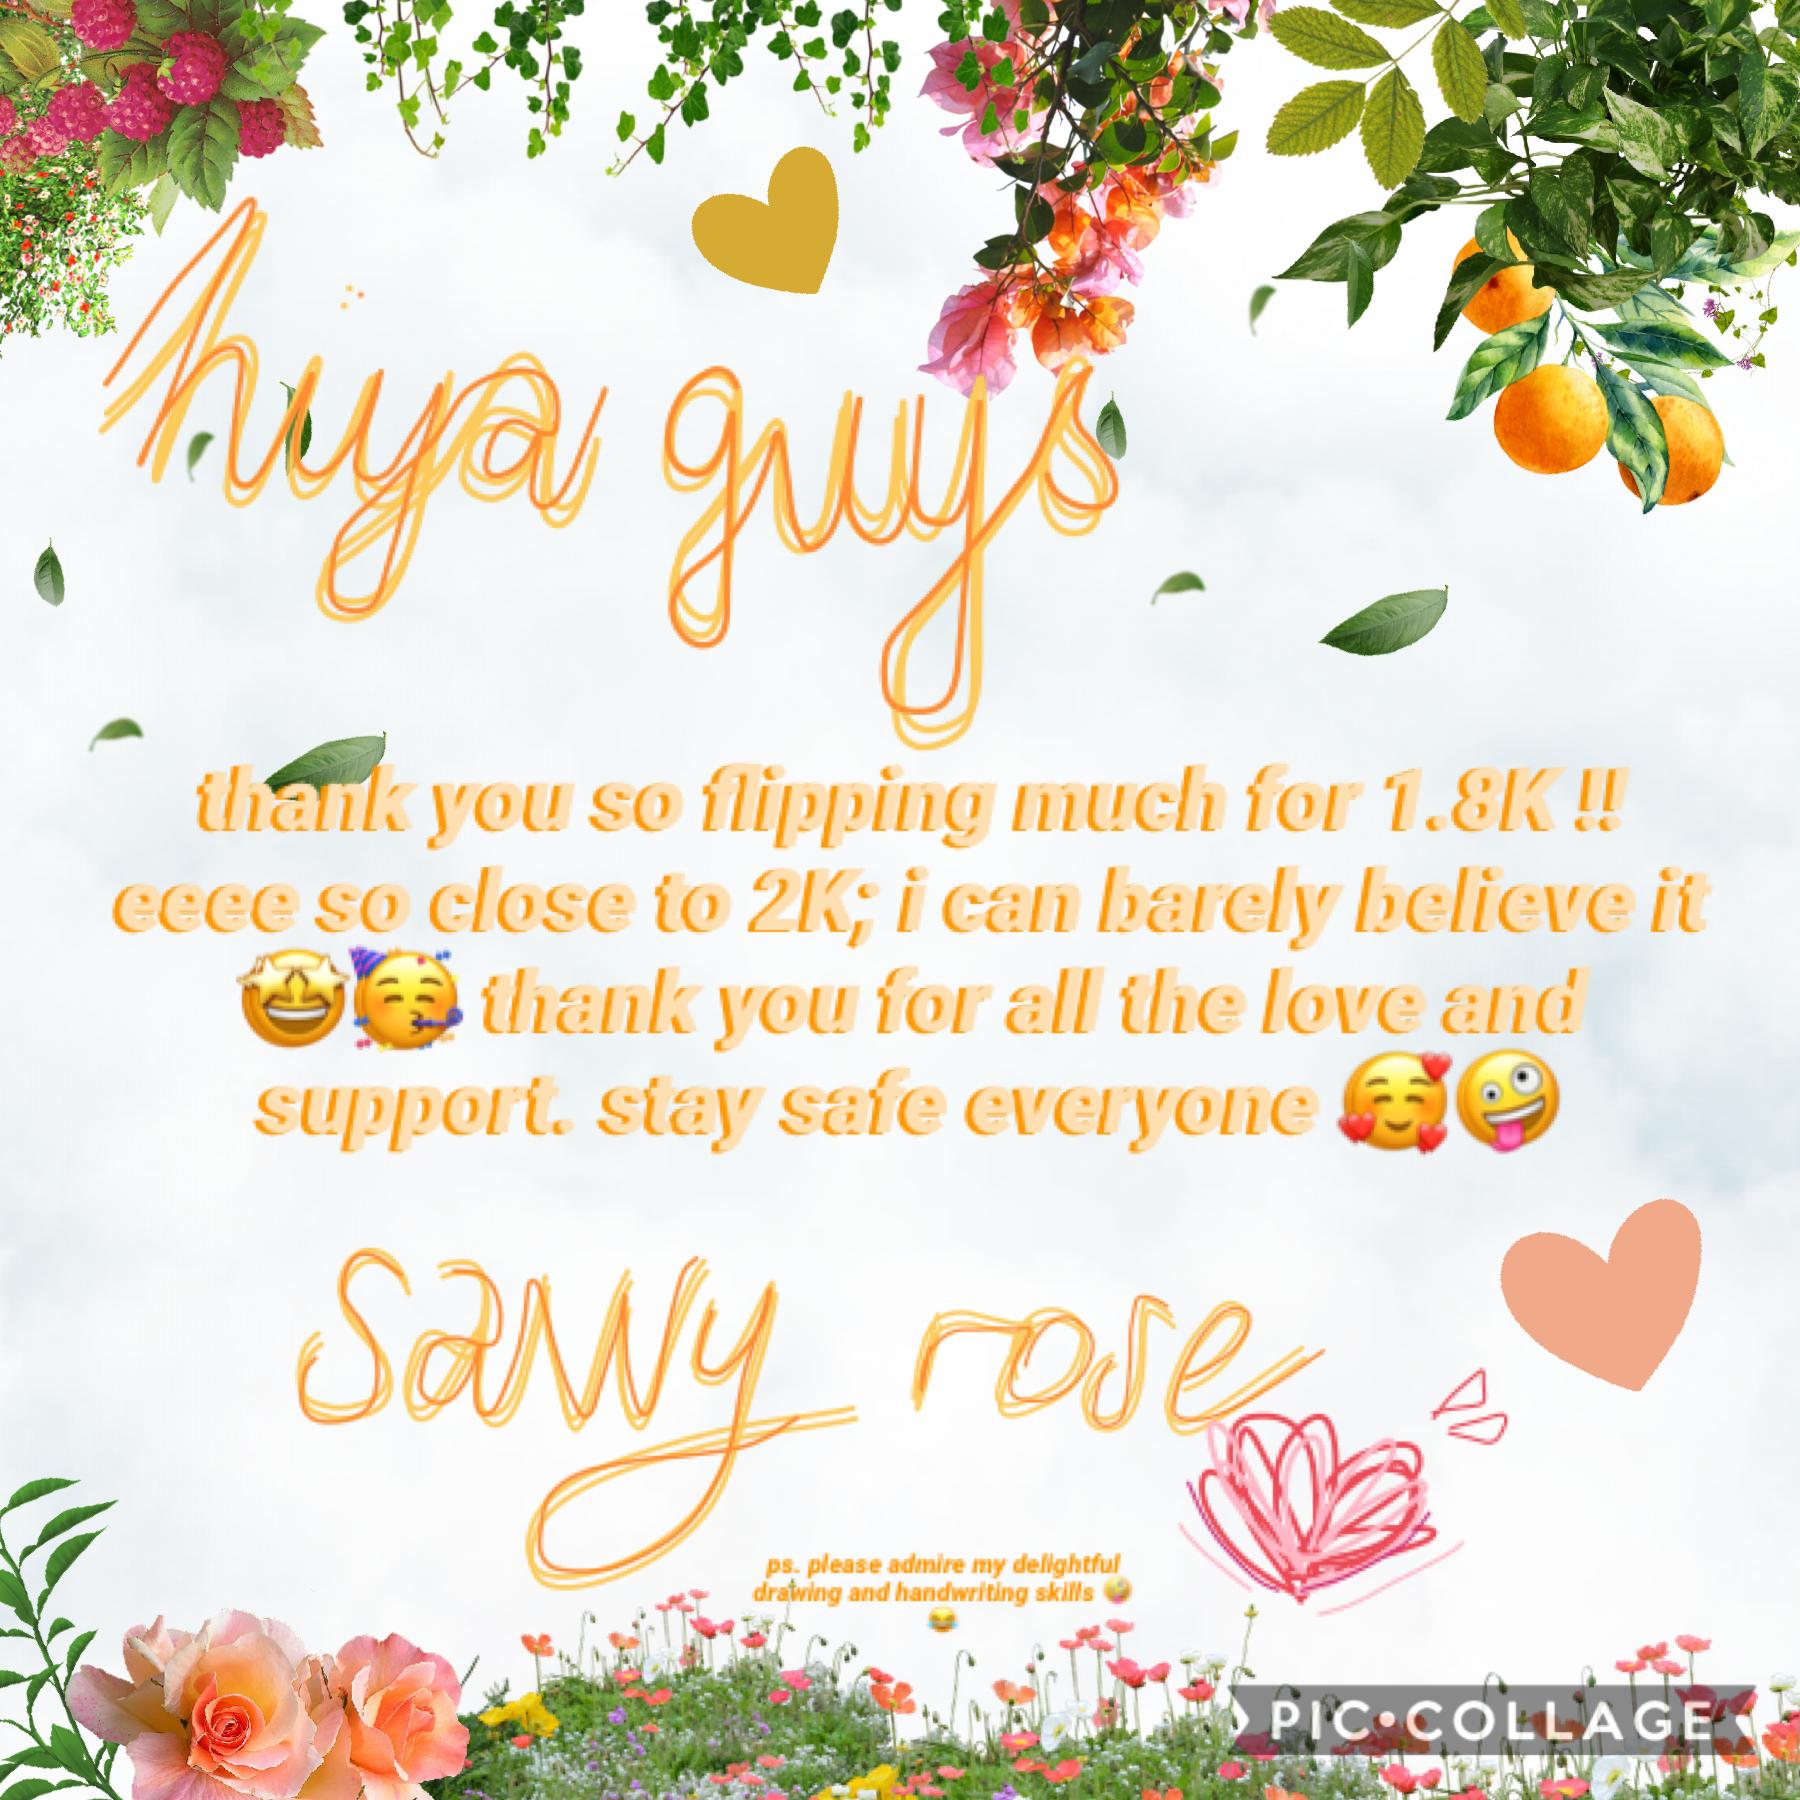 garden > ✨🌻☁️🌹🌿🌵🌷🌞🕊🦋🌳⚡️🌼🦋🌸🌱🍃🌟🌾🐿 hehe love you guys 🤪🥰